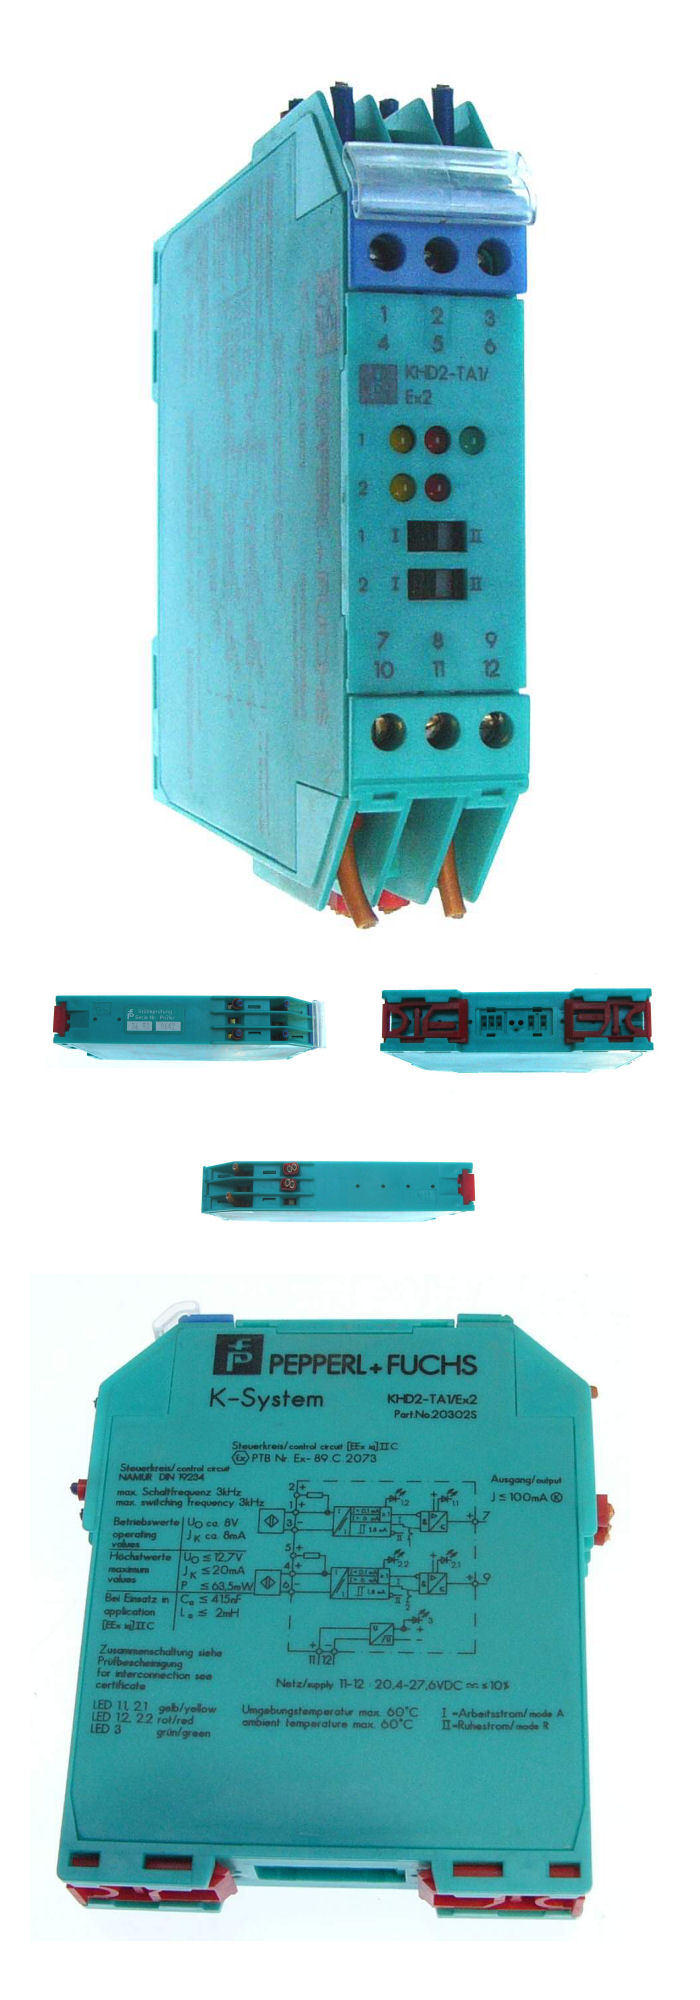 Pepperl Fuchs Trennschaltverstärker KHD2-TA1/Ex2